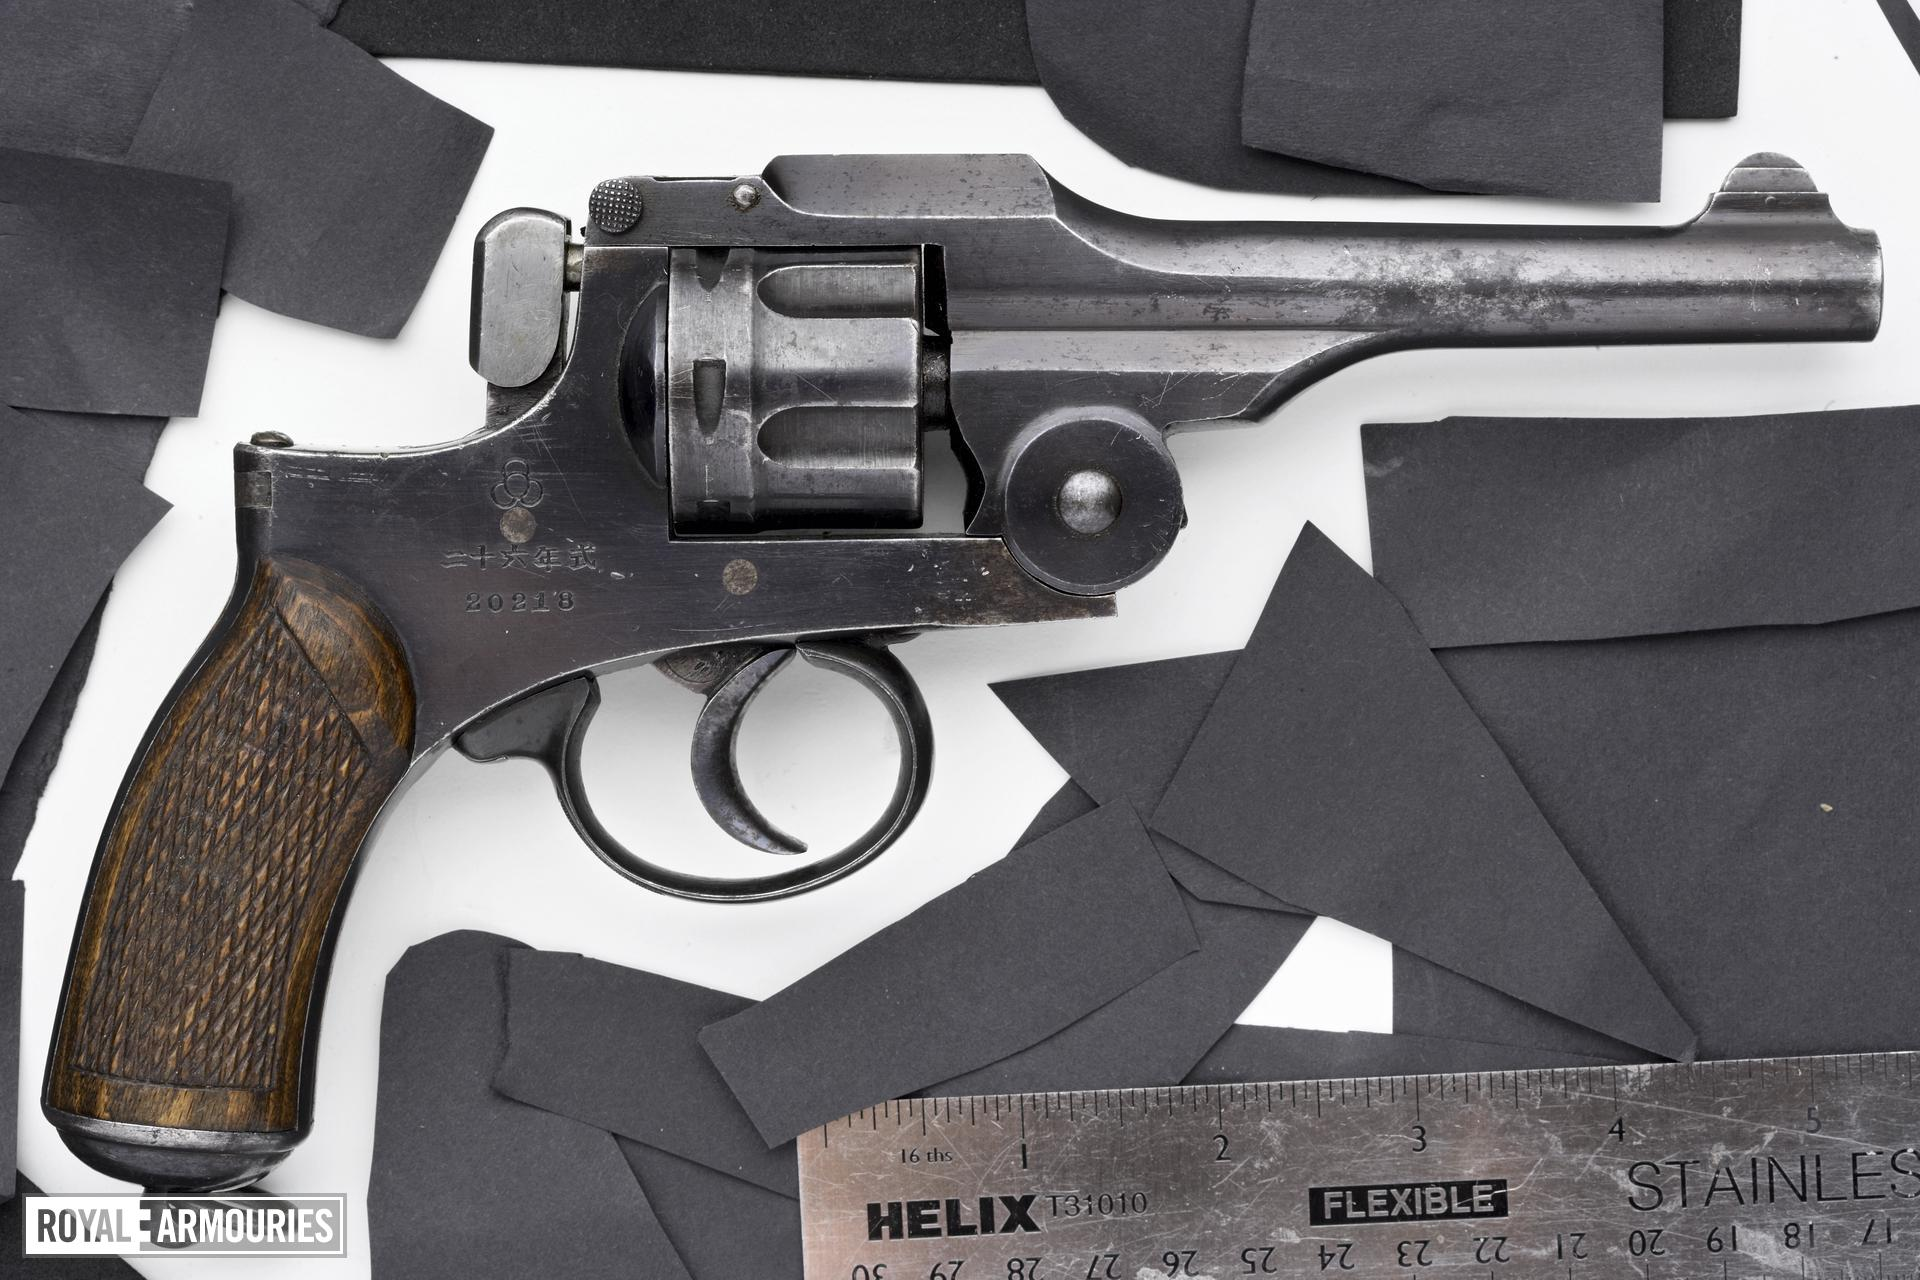 Centrefire six-shot revolver - Ordnance Type 26